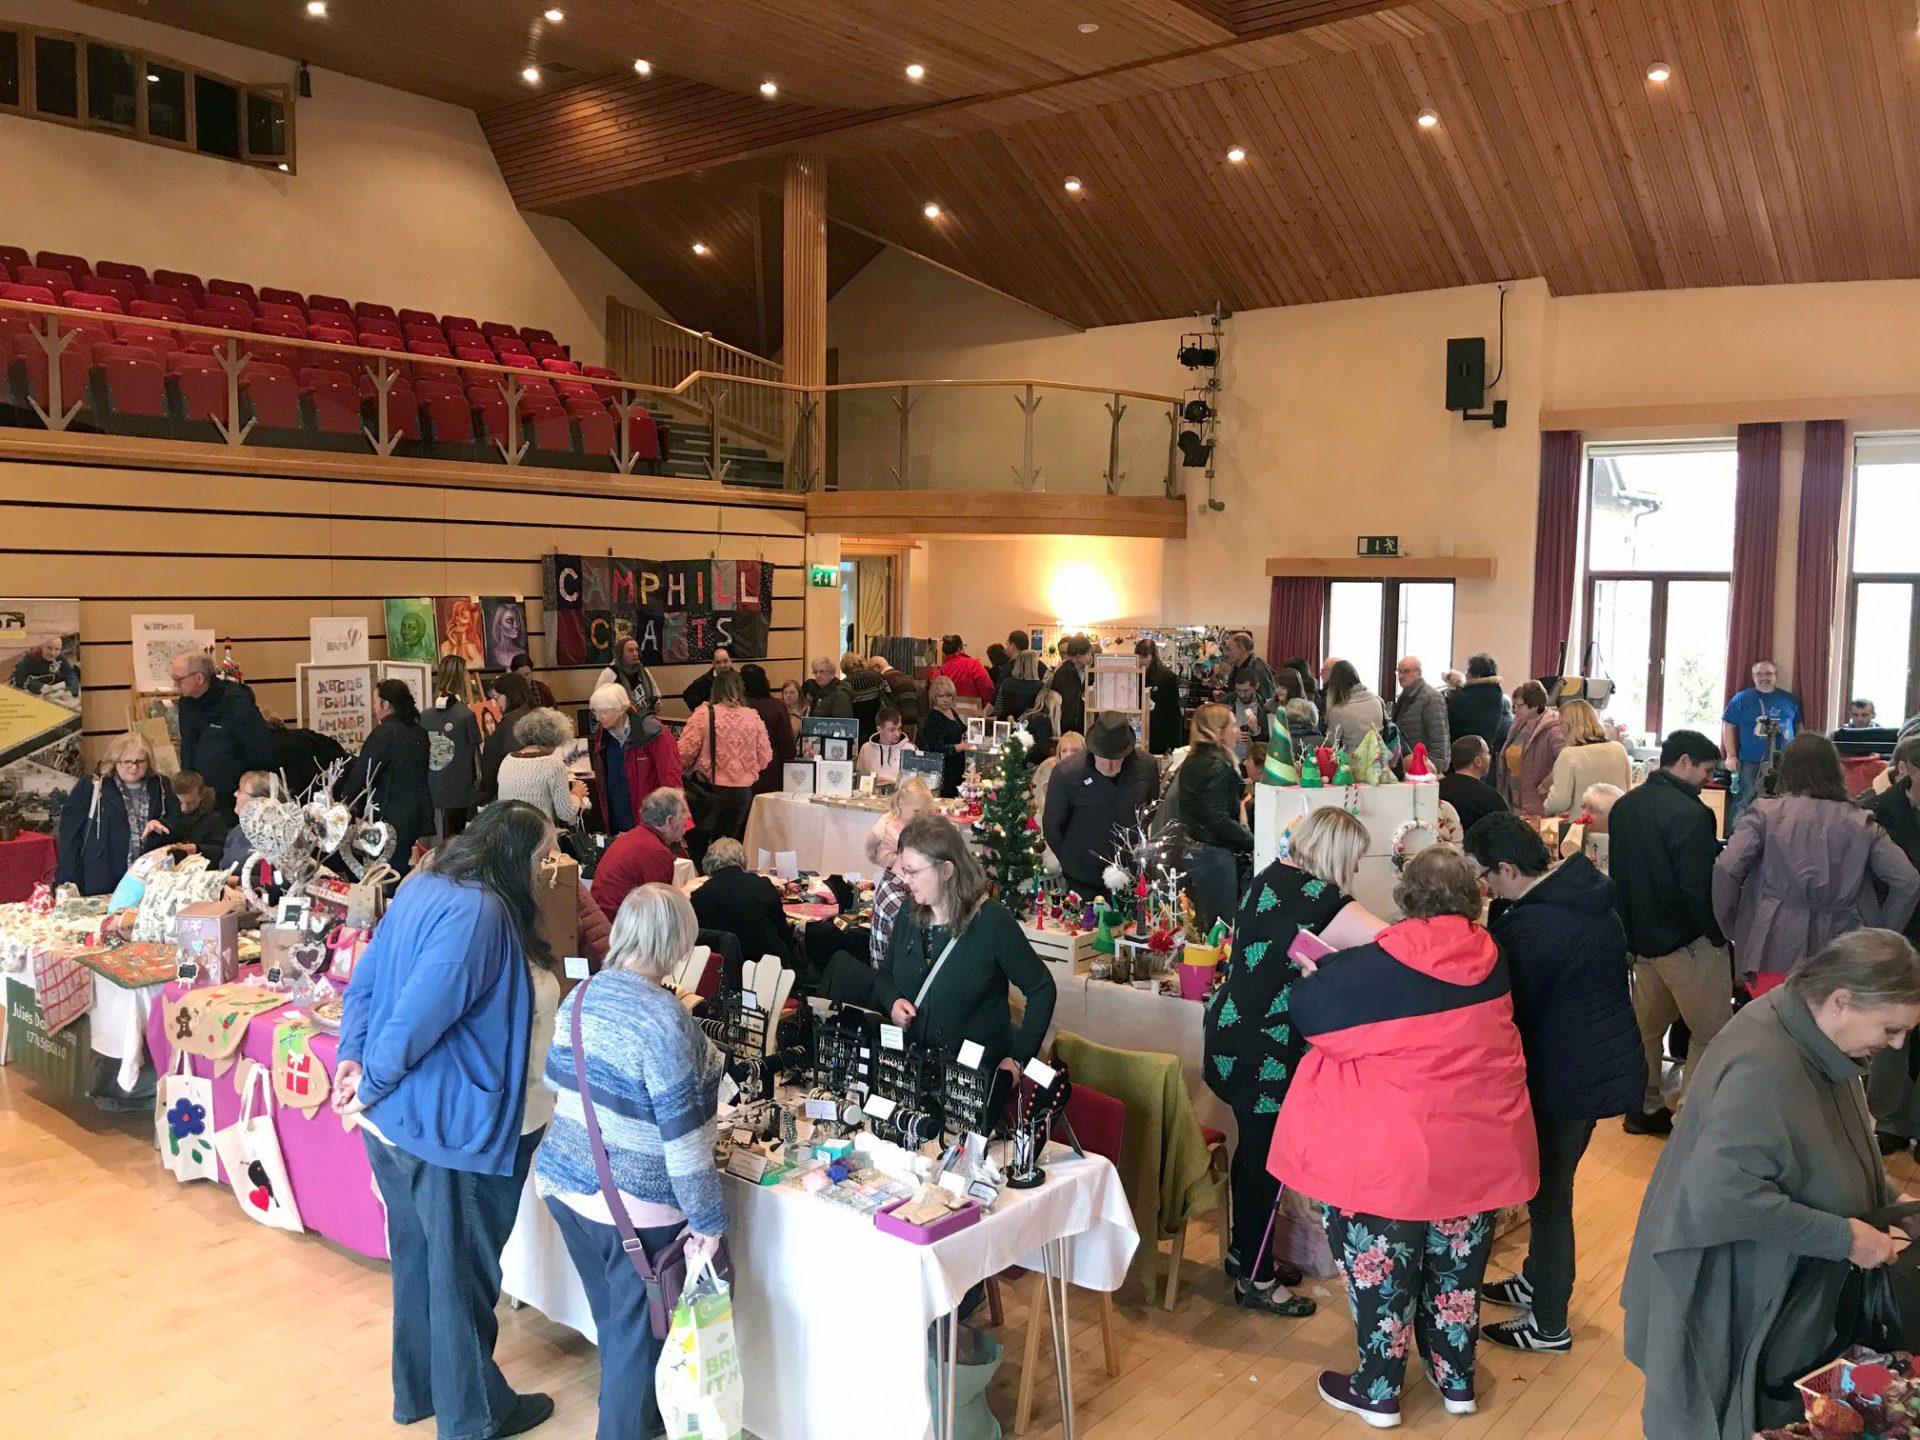 Camphill Craft Fair Success